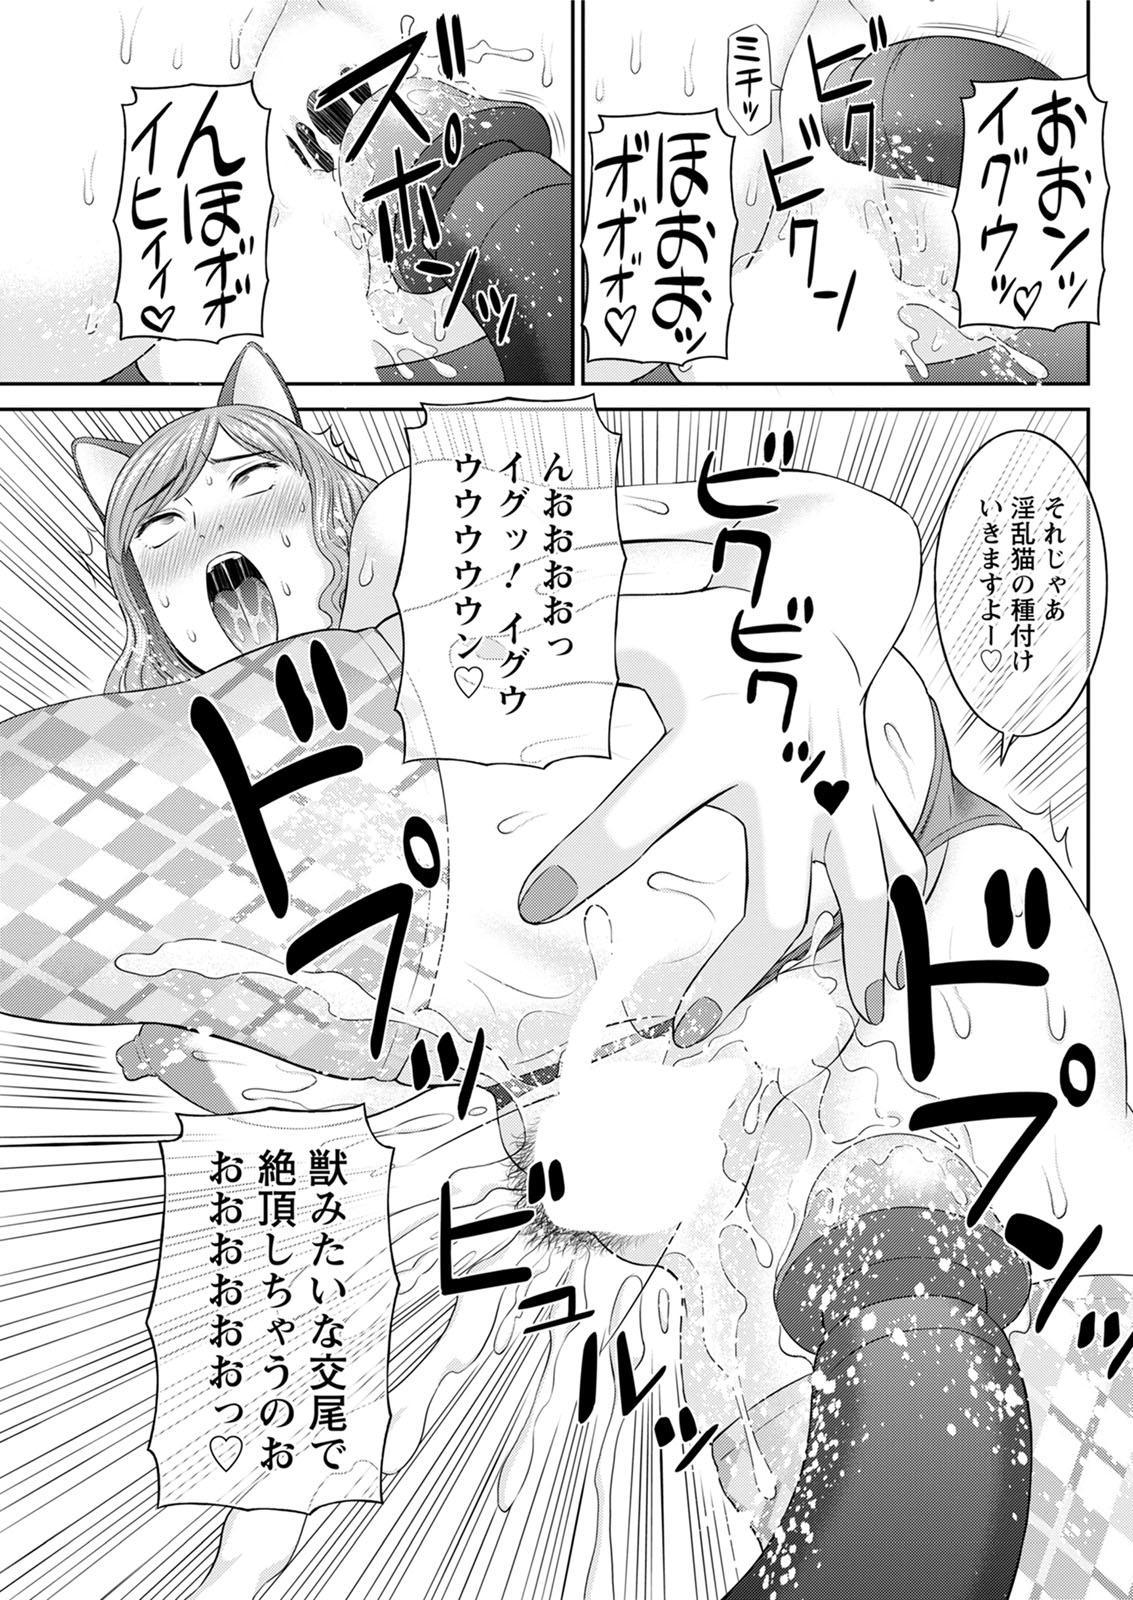 [Kawamori Misaki] Kaikan Hitotsuma Gakuen Ch. 1-6, 8-16 [Digital] 255